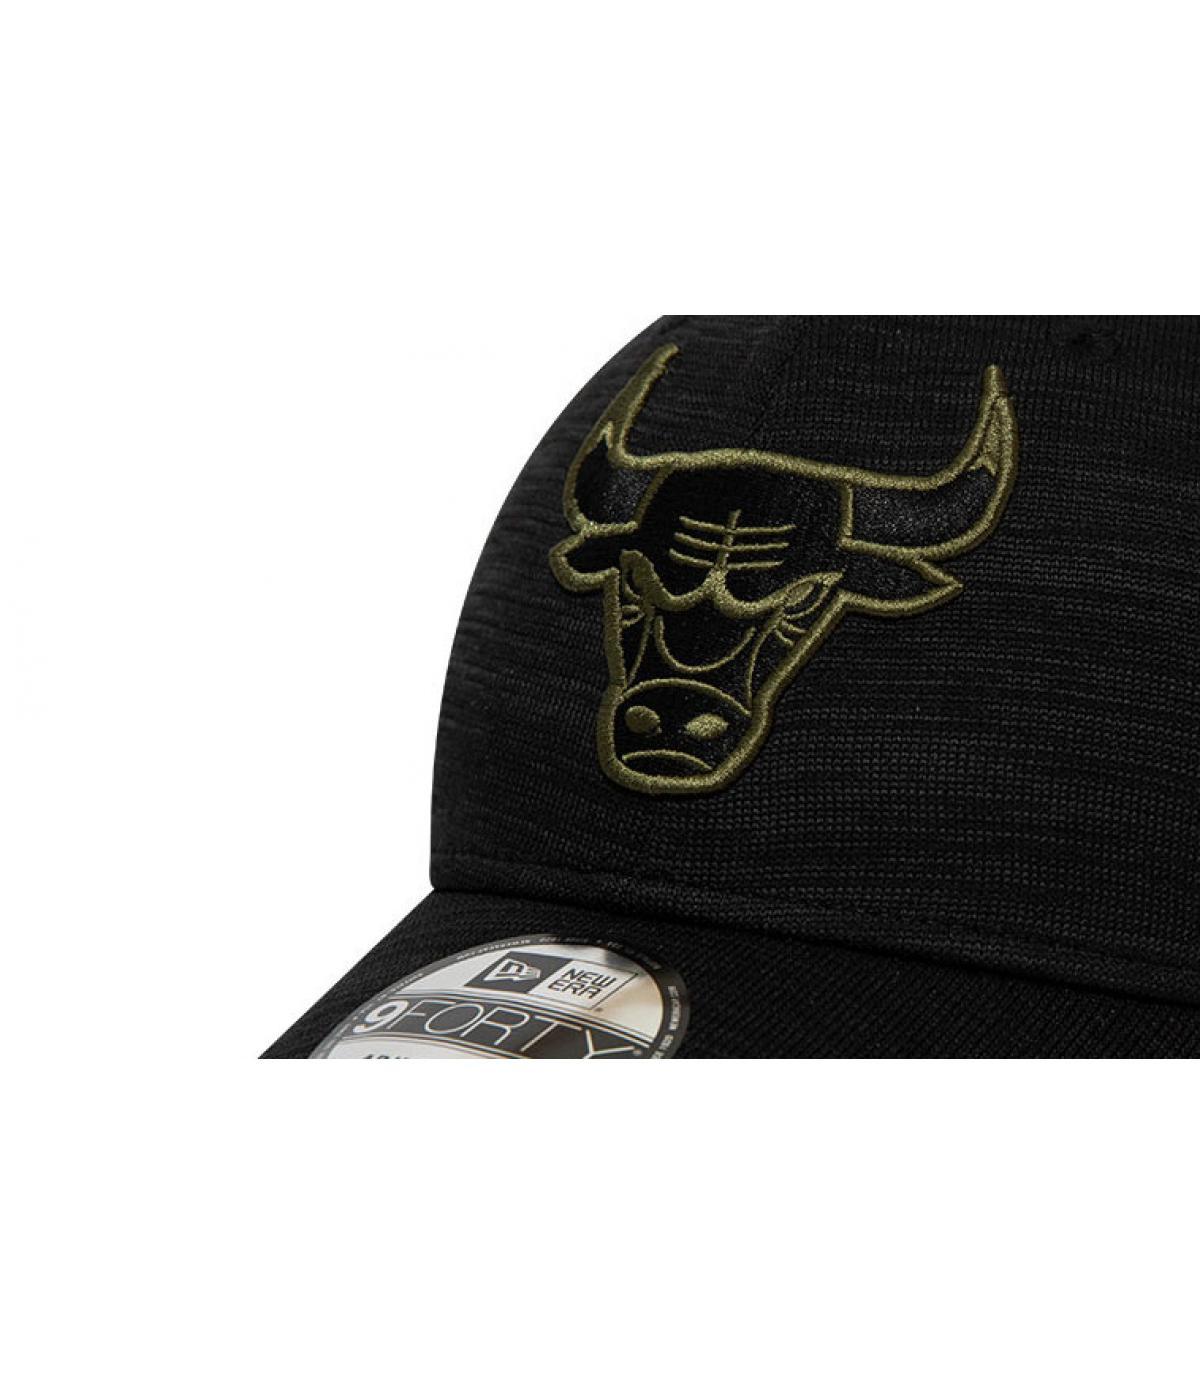 Détails Casquette Engineered Fit Bulls 940 black olive - image 3